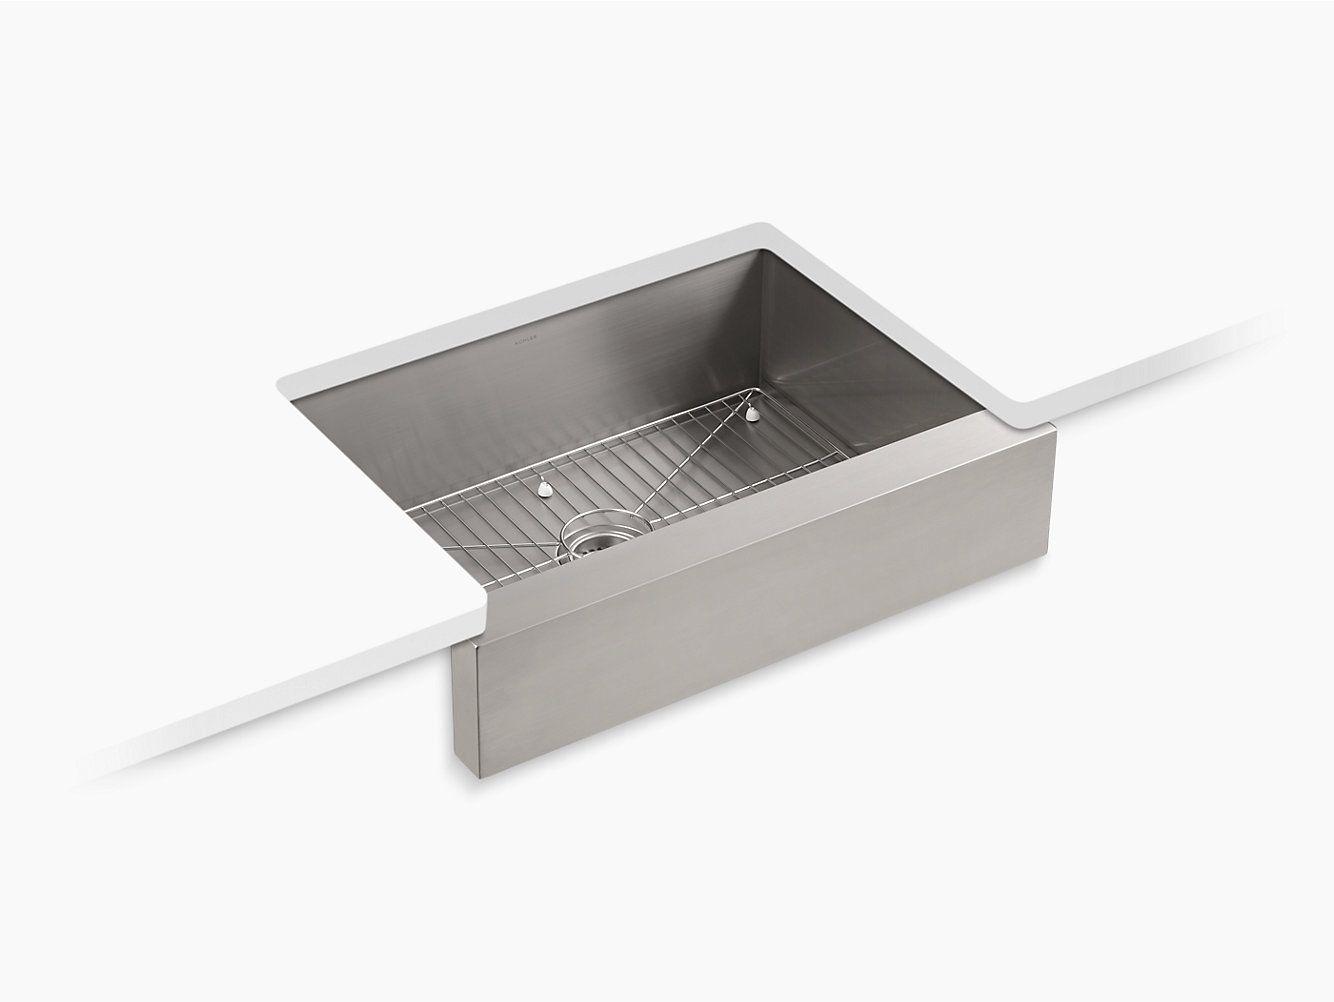 Vault Undermount Kitchen Sink K 3936 Kohler Kohler Apron Front Kitchen Sink Sink Kitchen Sink